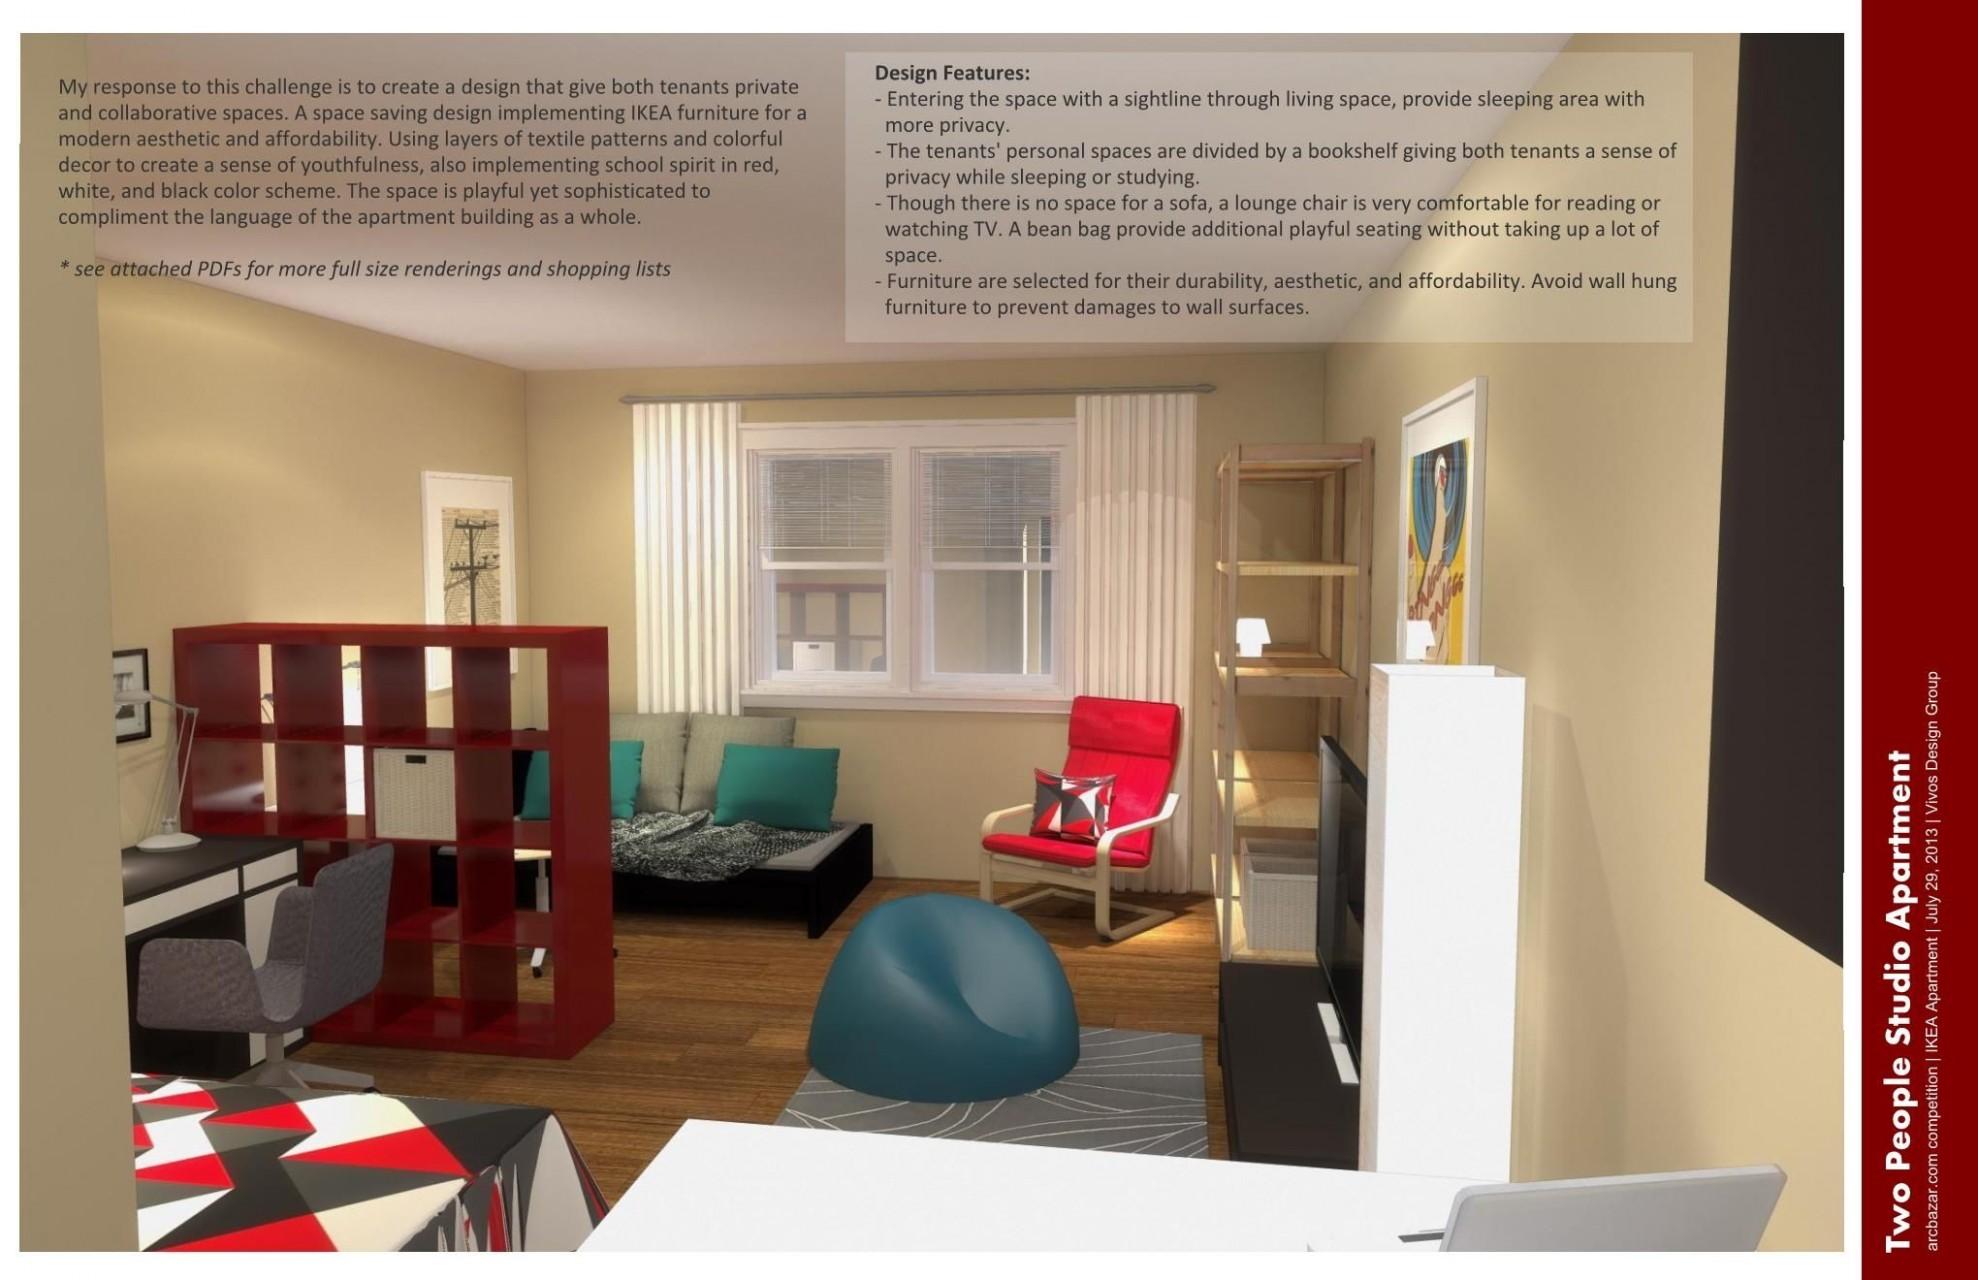 IKEA Studio Apartment Design Ideas  apartment bedroom : Small  - Apartment Decorating Ideas Ikea